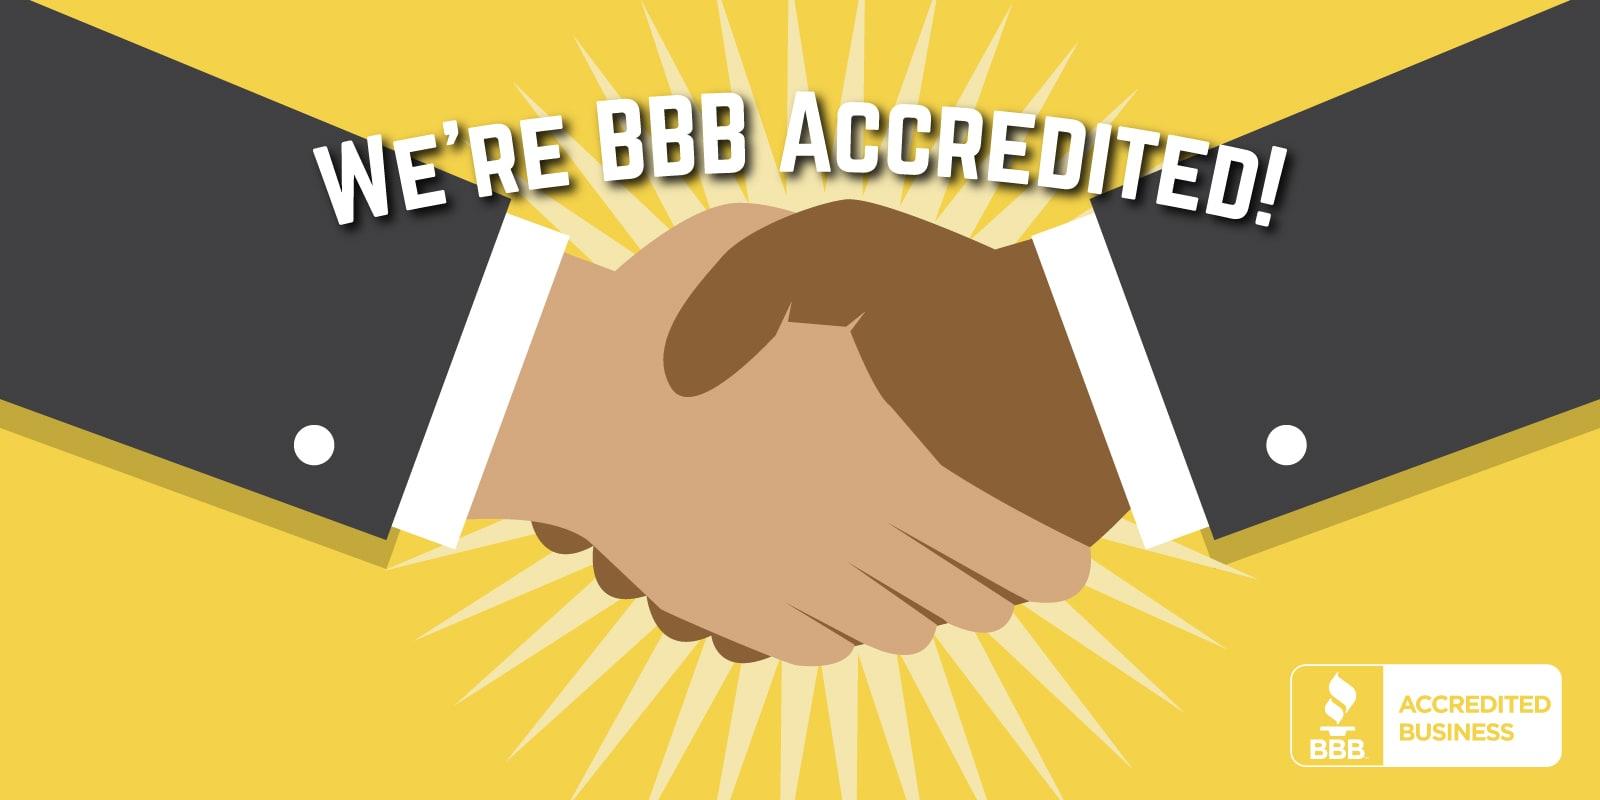 Better Business Bureau Accreditation handshake graphic